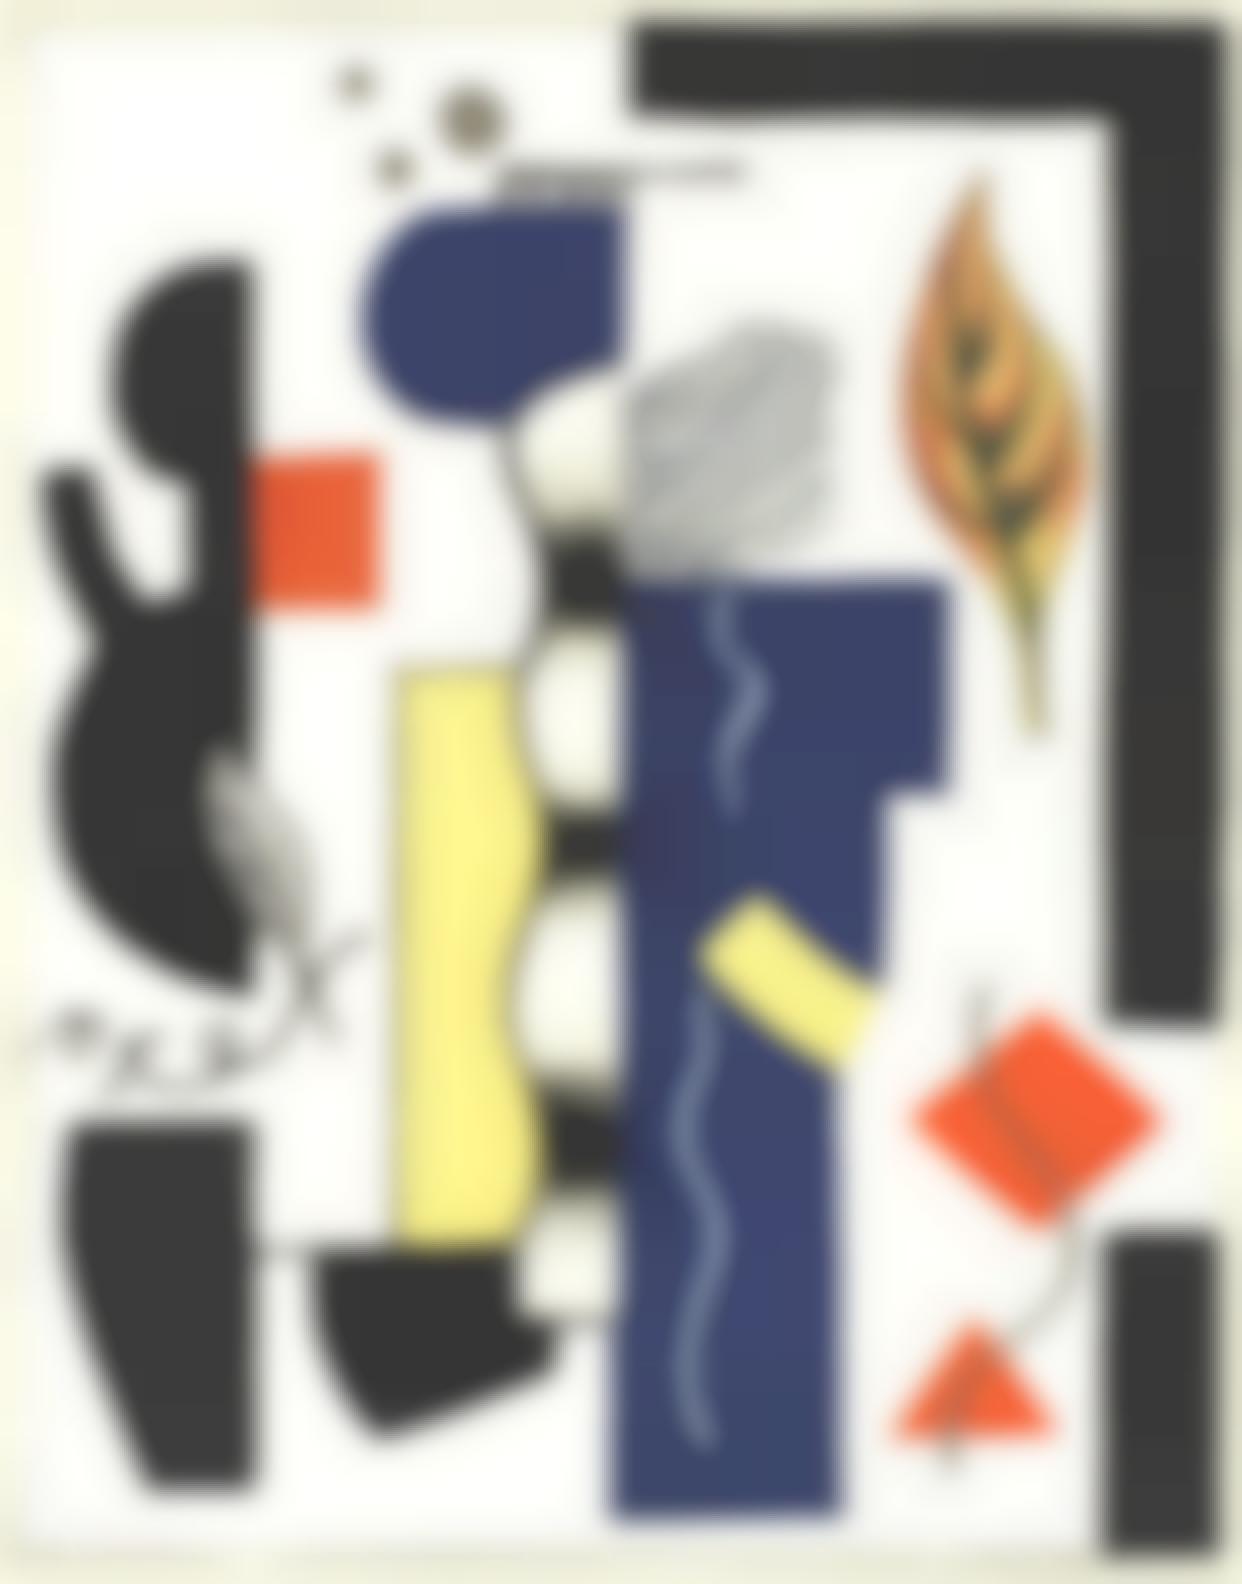 Fernand Leger-Fernand Leger - Les Grands Peintres Dauhourdhui, Volume 4-1928